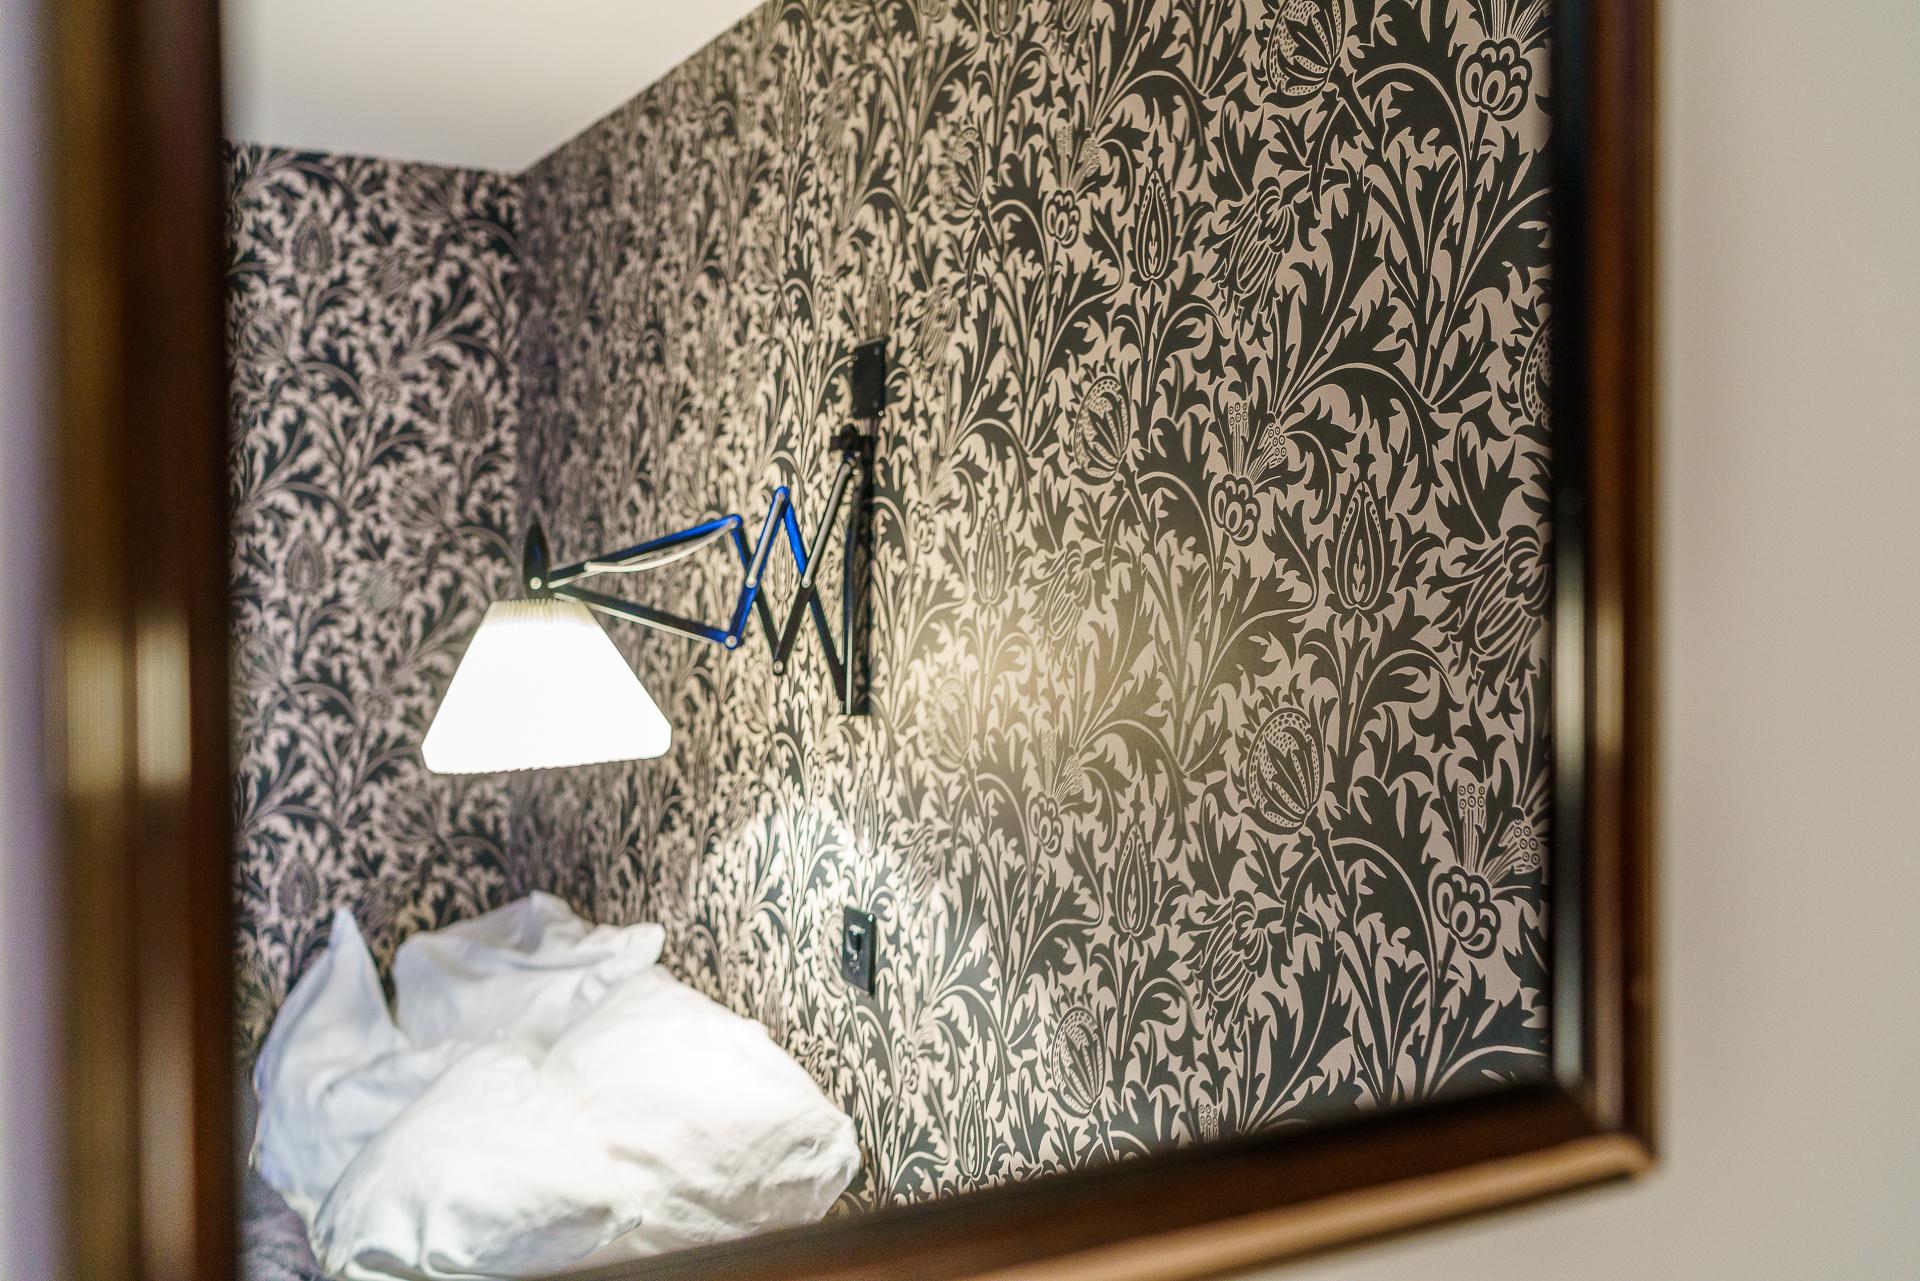 Zimmer-Zevraila-Bruecke-49